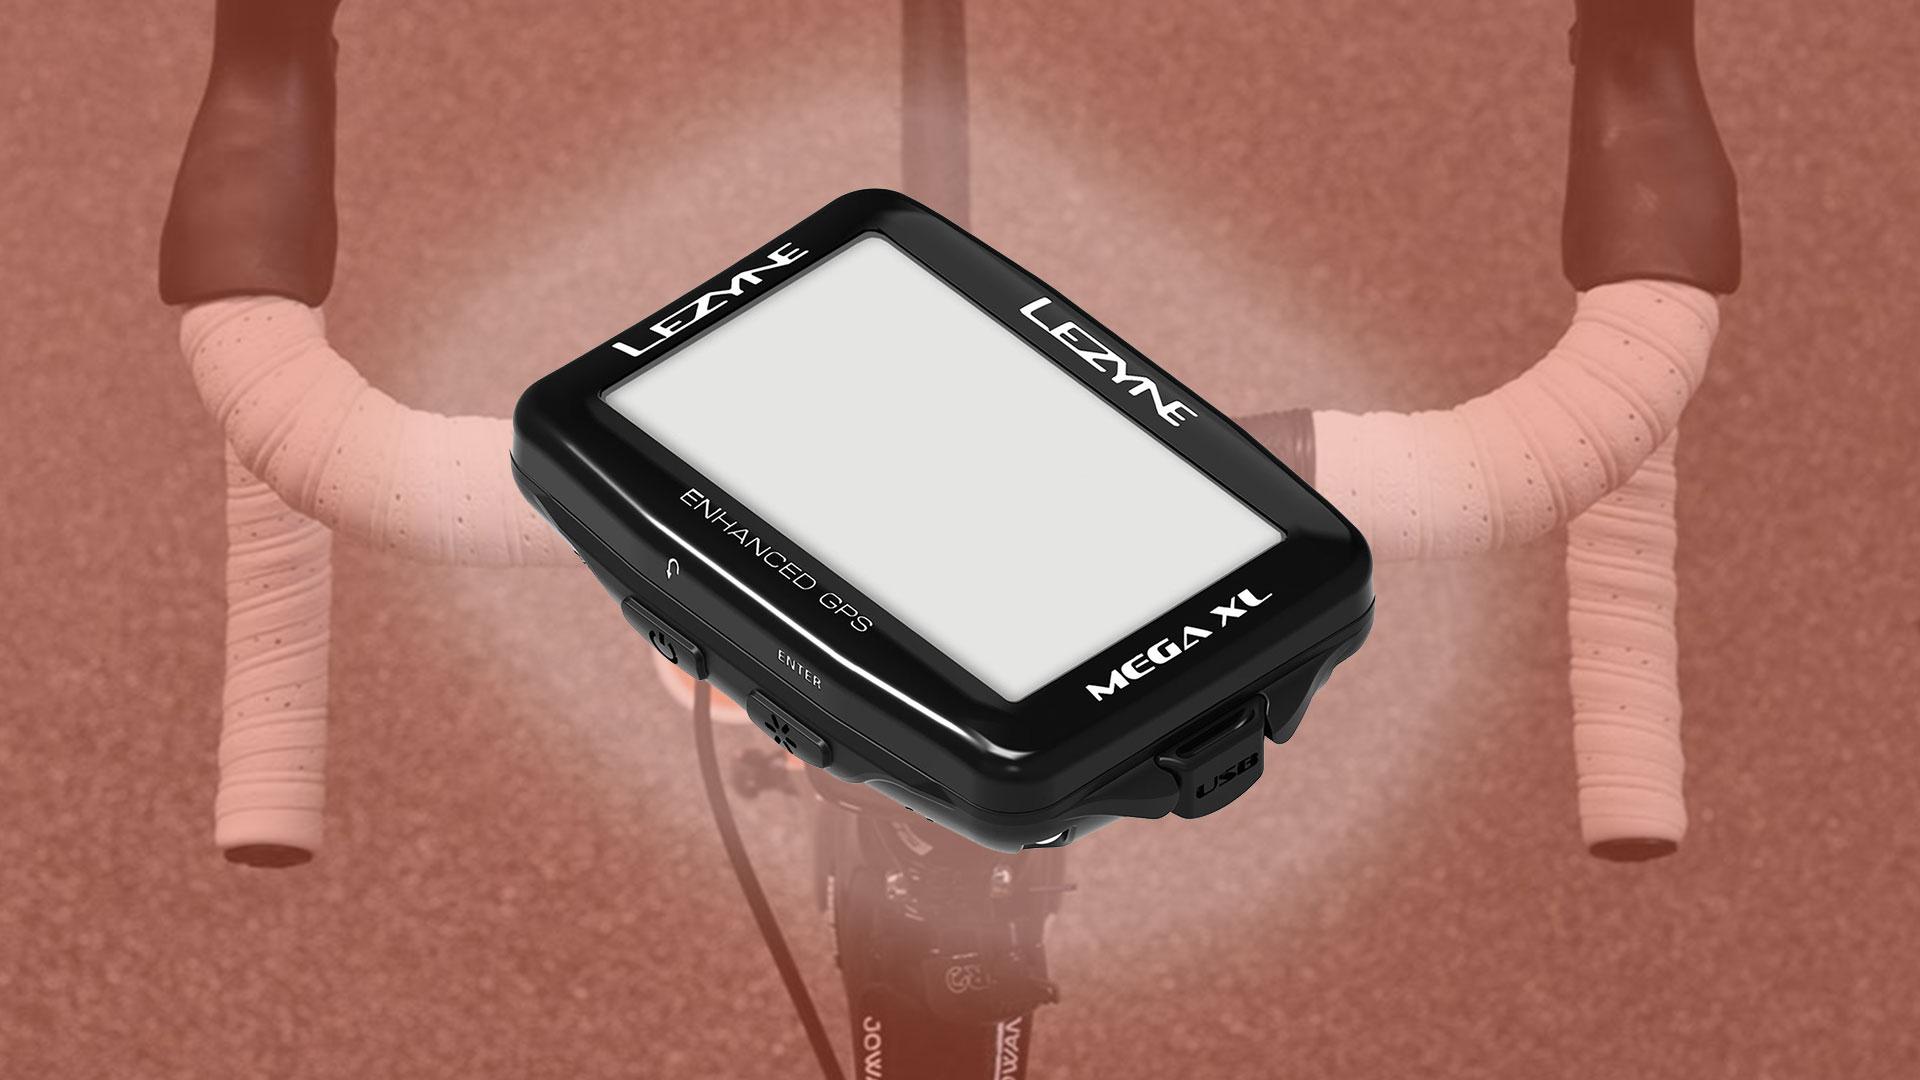 Lezyne Mega XL review: GPS fietscomputer en navigatie